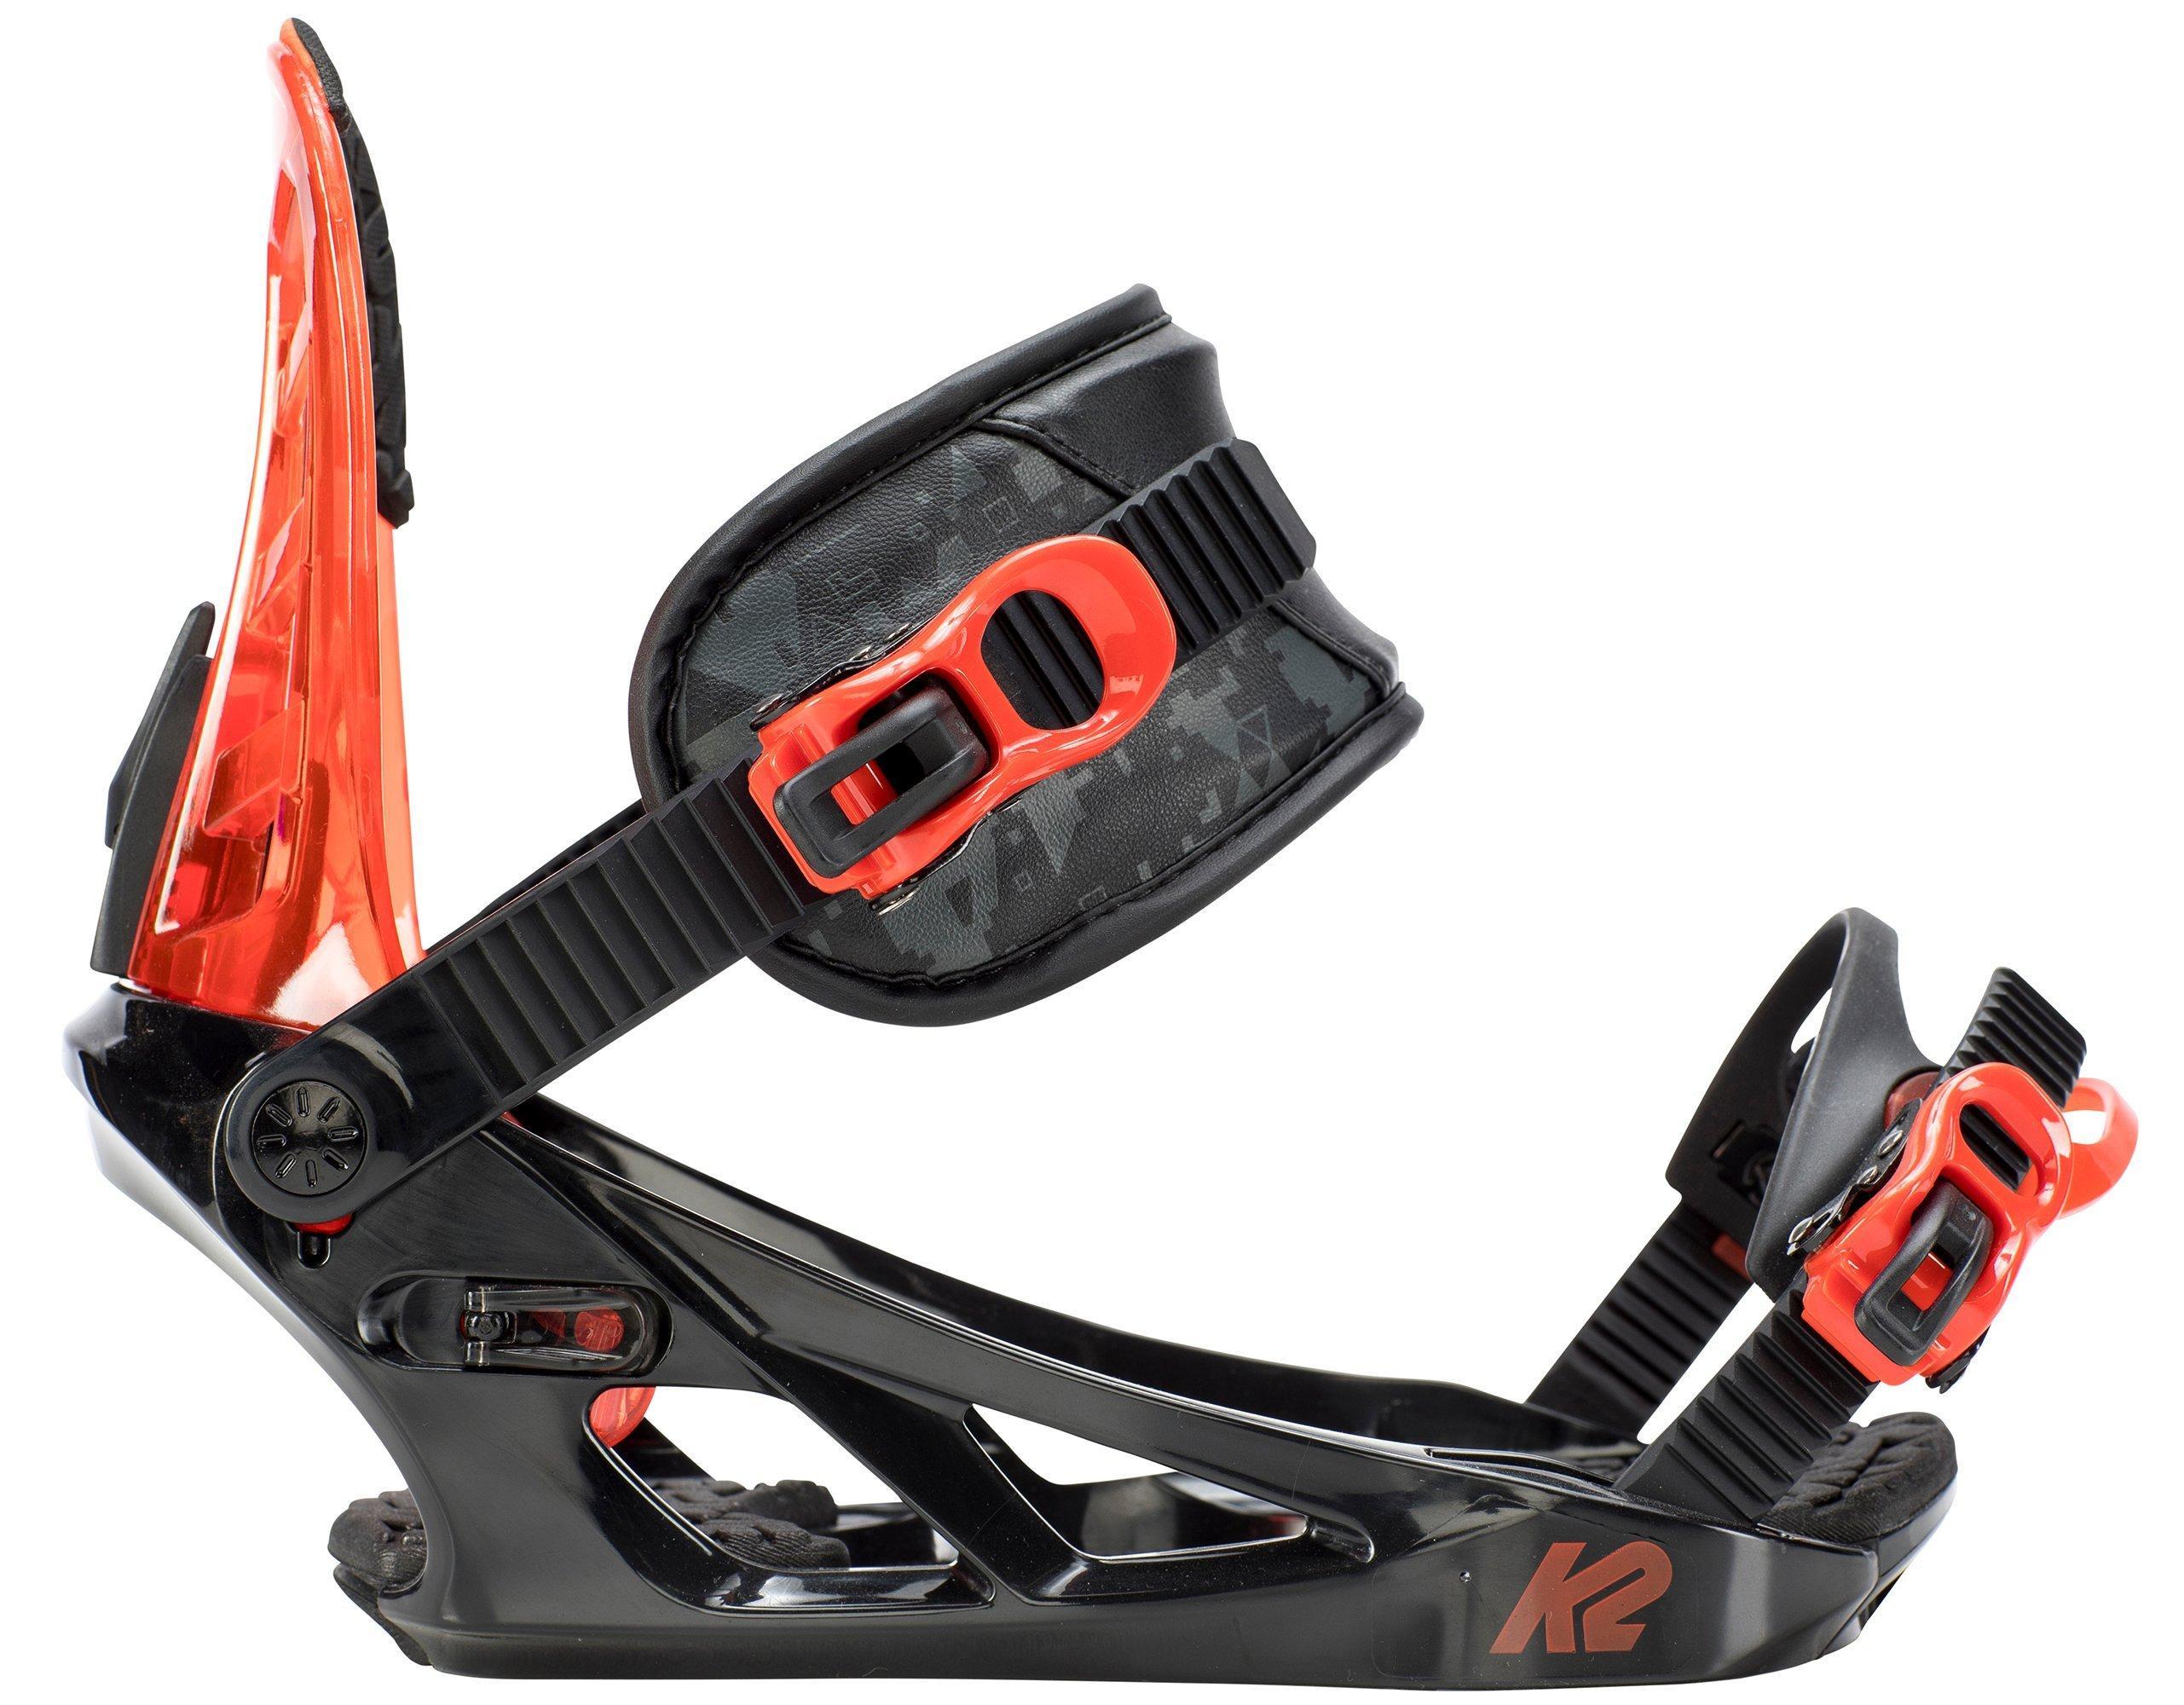 a86a19c5ab15 Vandal - K2 Snowboarding